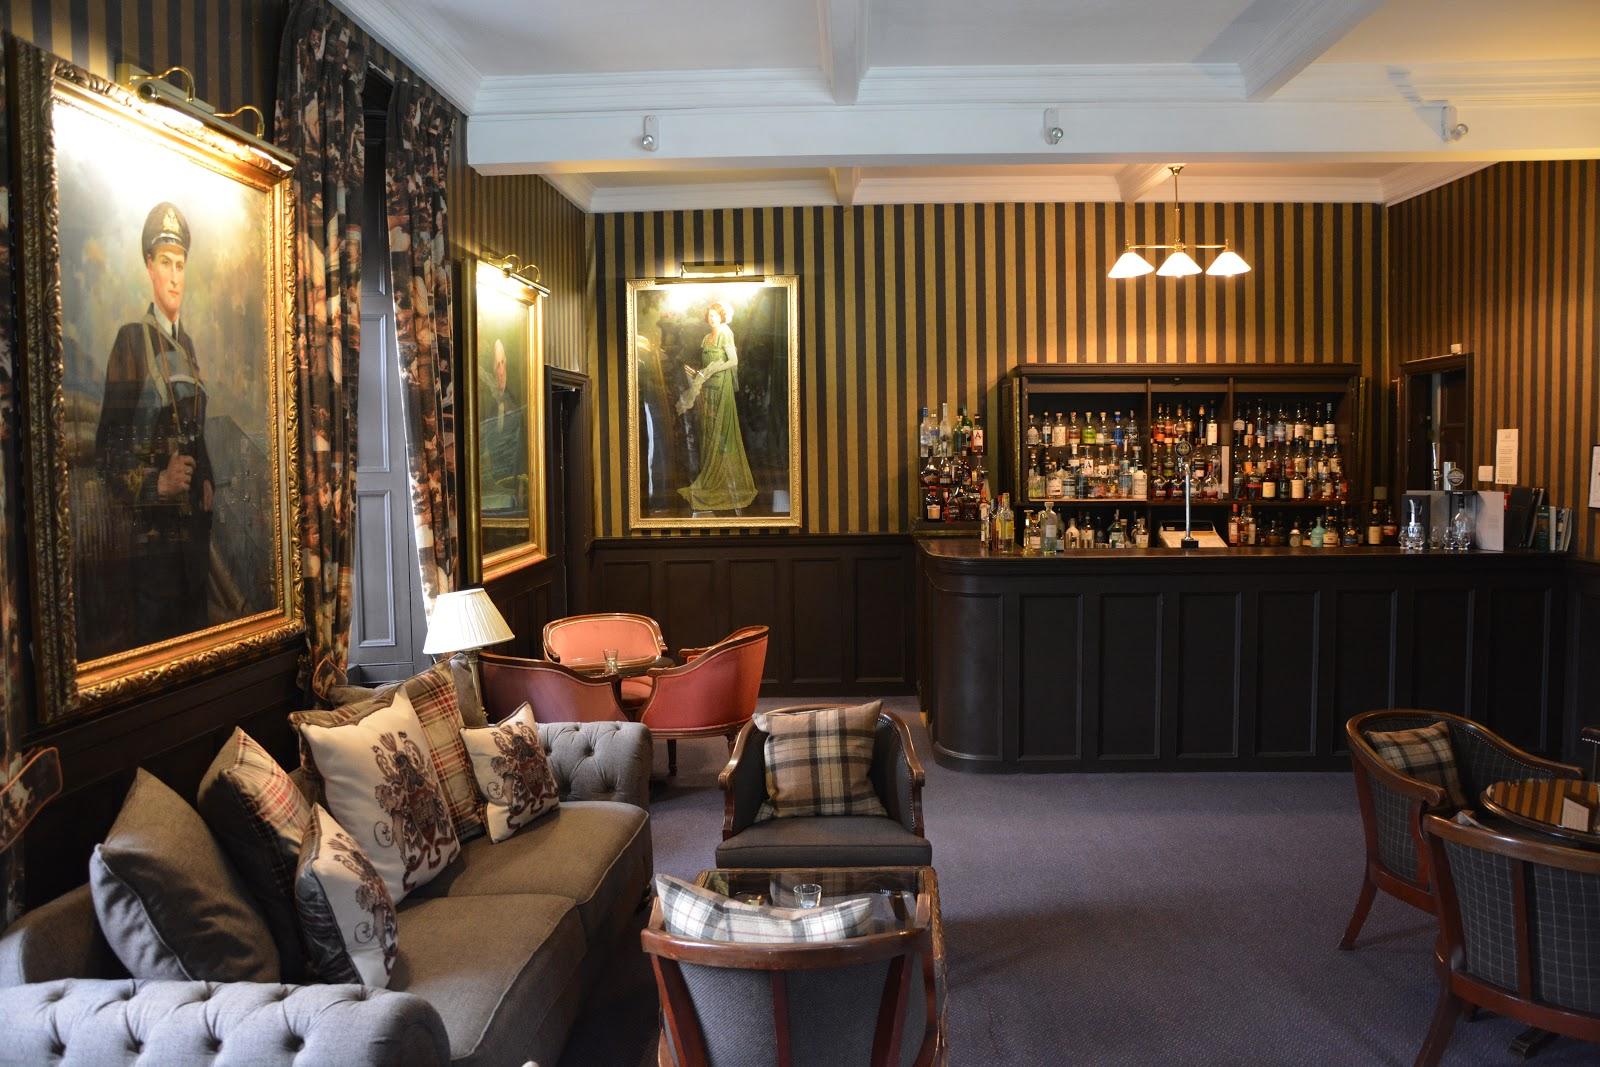 castle sofa house of fraser simmons beautyrest solveig in scotland